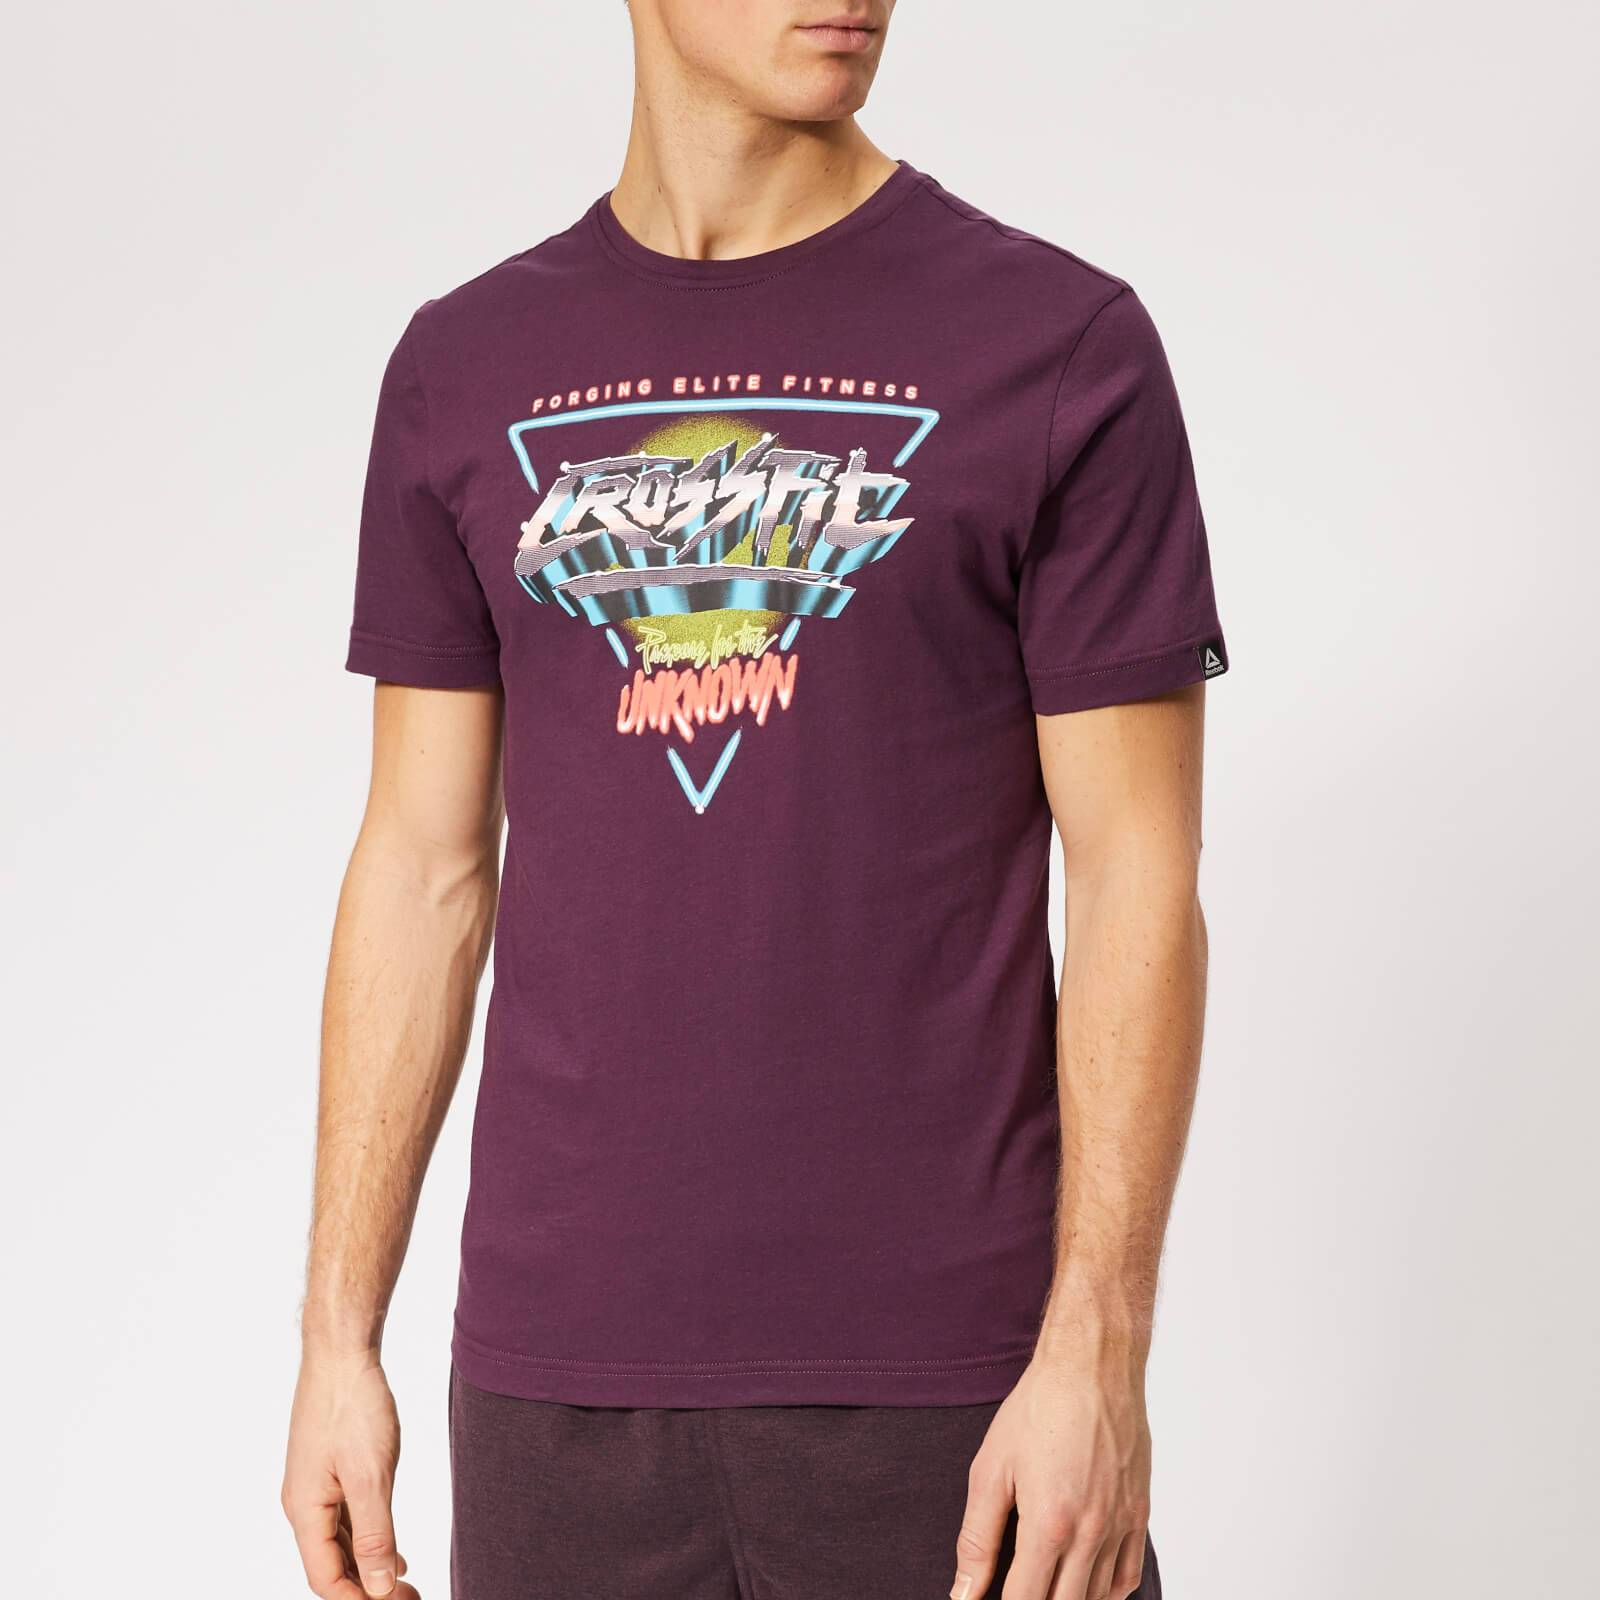 Reebok Men's Crossfit Neon Retro Short Sleeve T-Shirt - Purple - XL - Purple